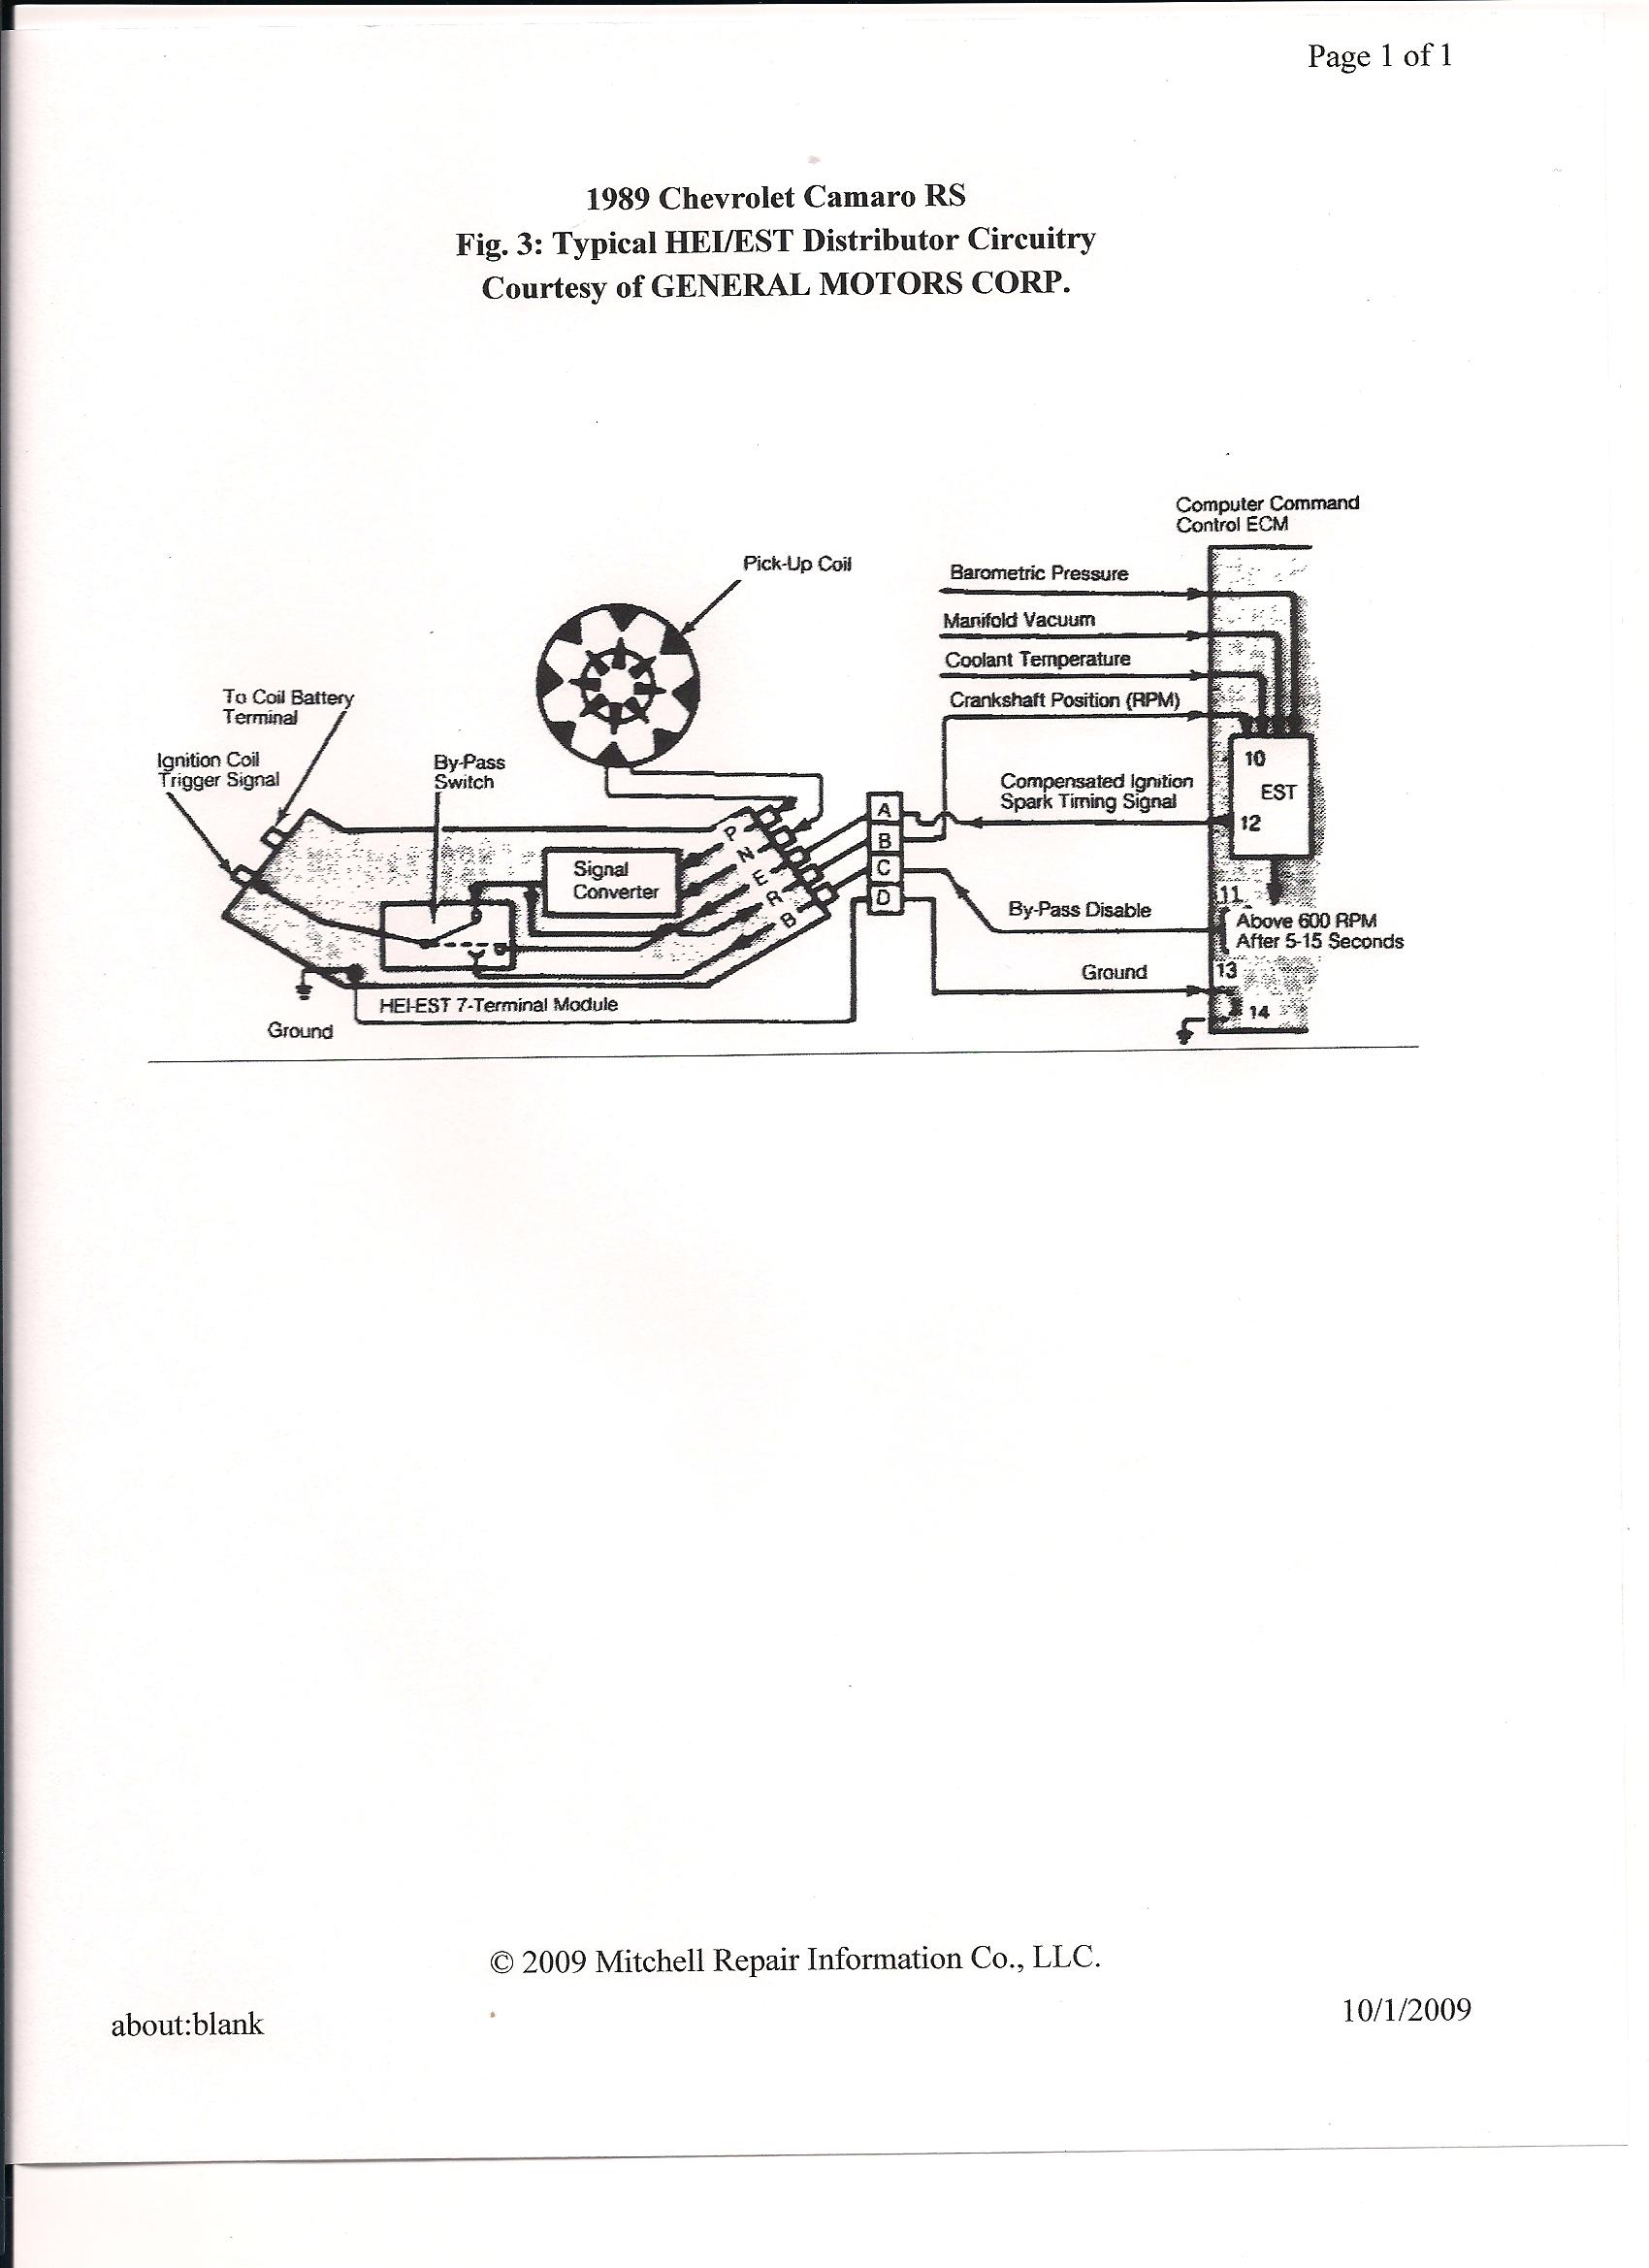 1978 Camaro Wiring Diagram Rpm Tach